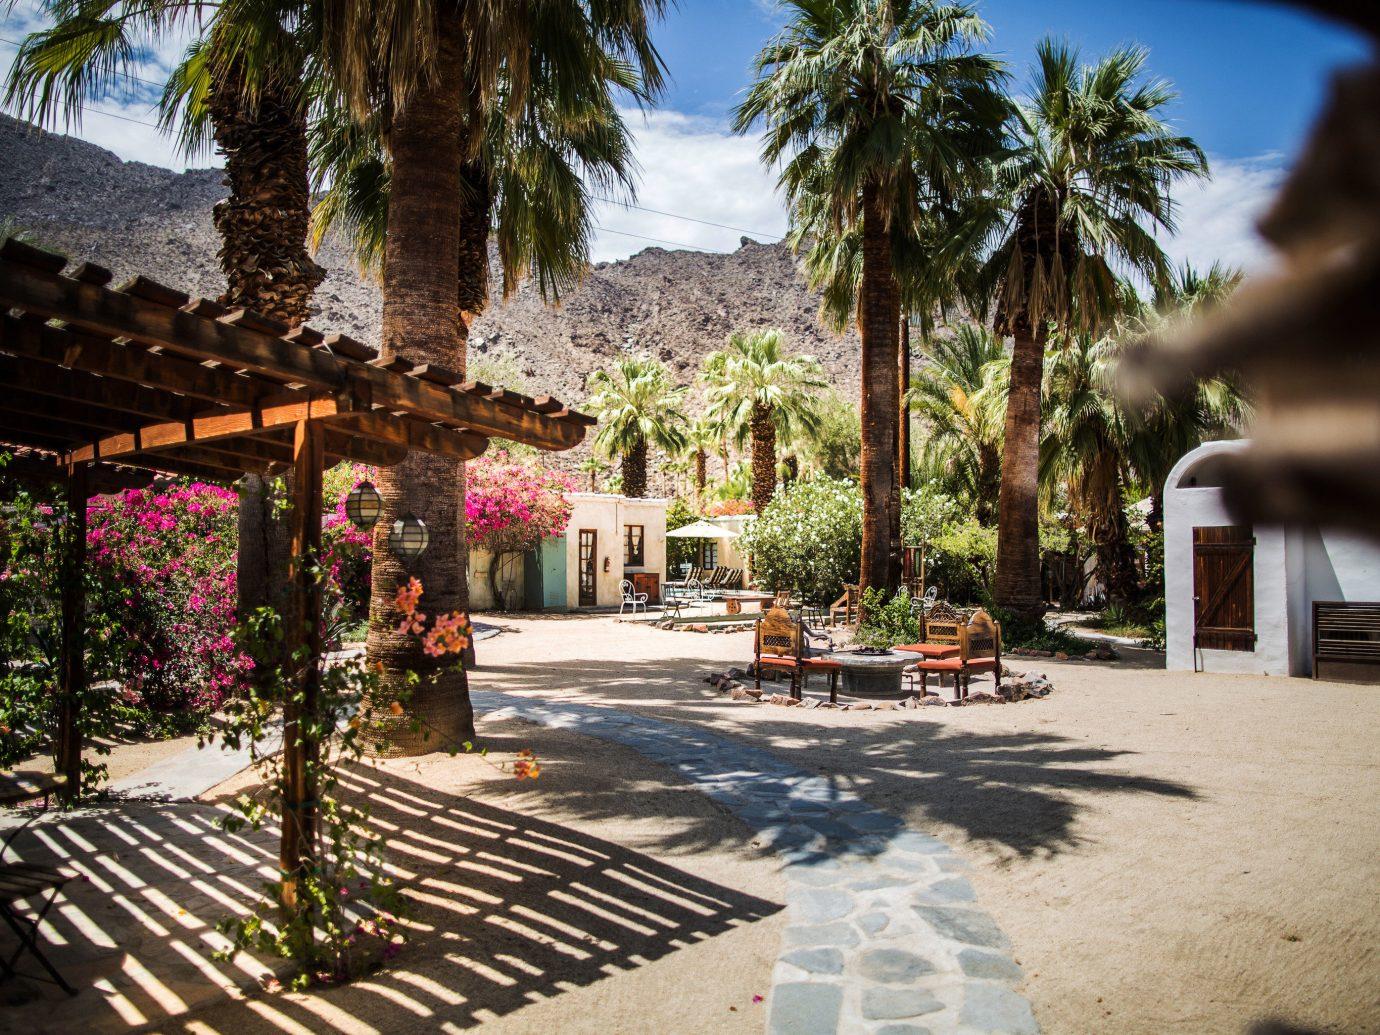 Editors Picks Luxury Travel Trip Ideas tree outdoor estate Resort vacation Courtyard home hacienda arecales mansion Villa backyard Village flower